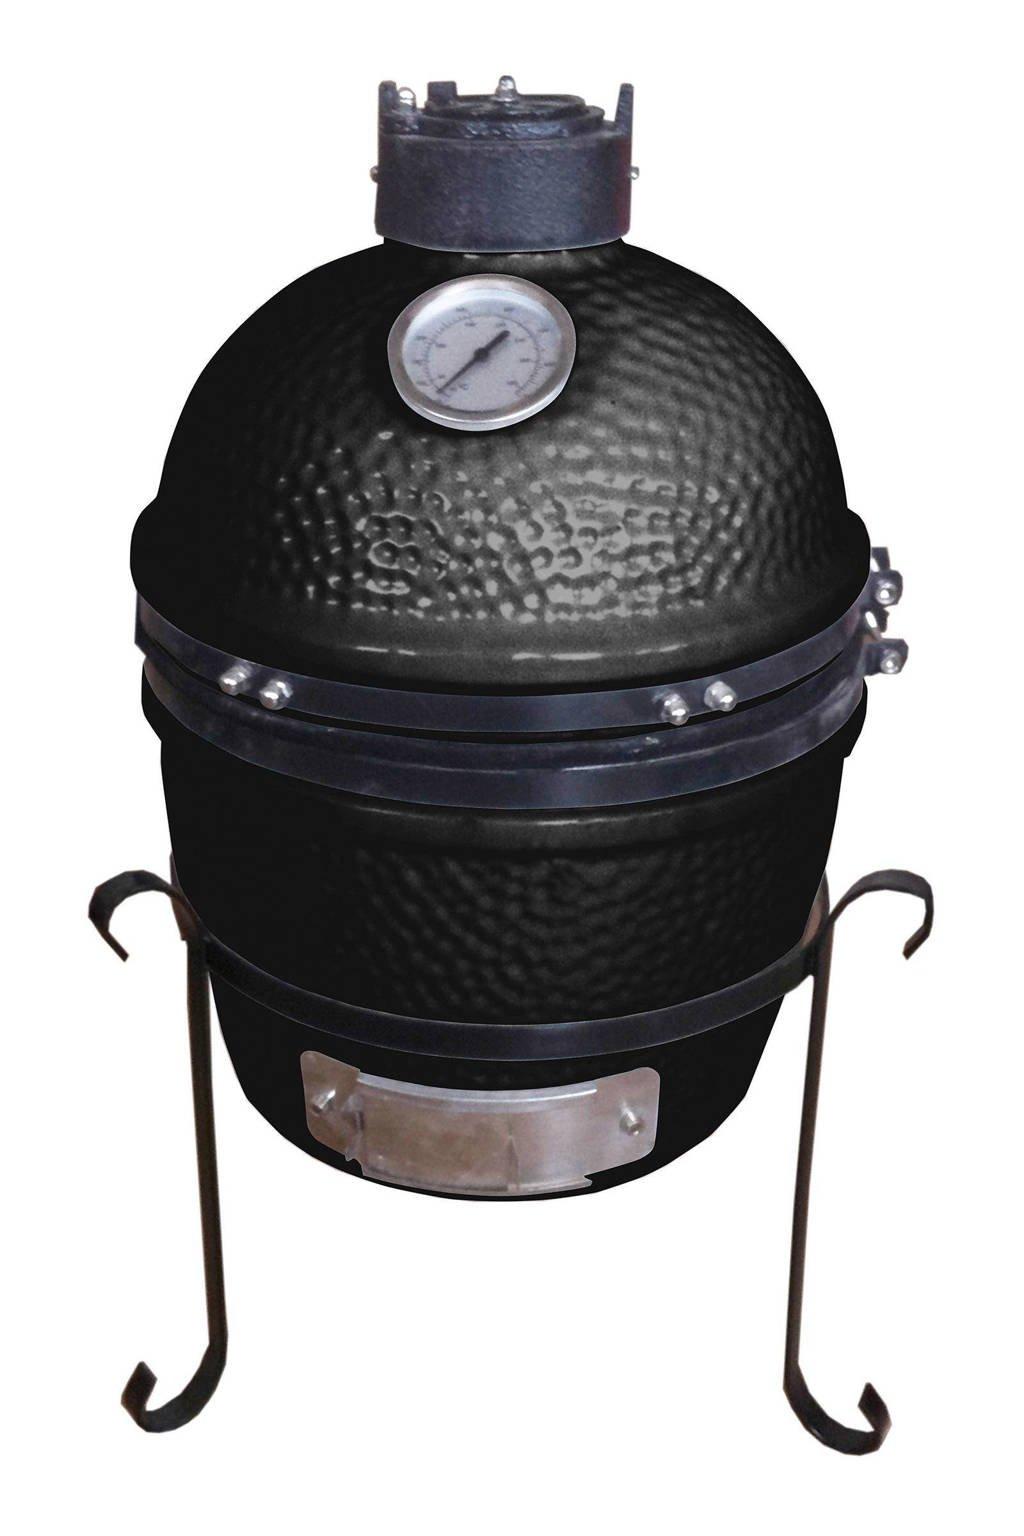 Patton Kamado Grill 13'' houtskoolbarbecue, Zwart